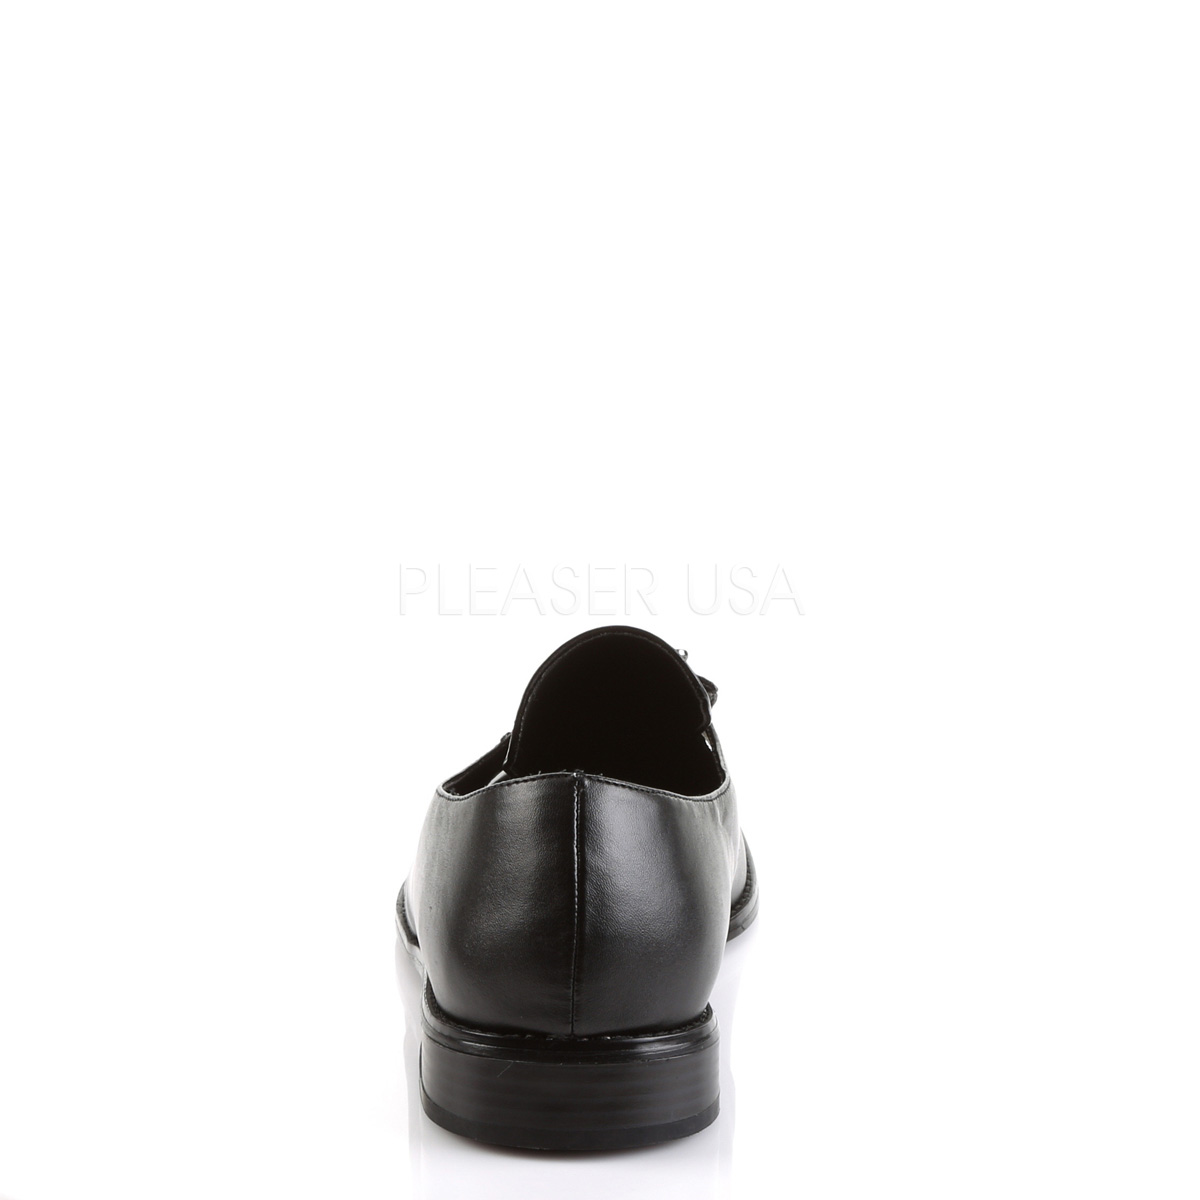 FUNTASMA PILGRIM-10 #Men's メンズ モンクストラップシューズ 靴 シューズ バックル Pleaser◆取り寄せ